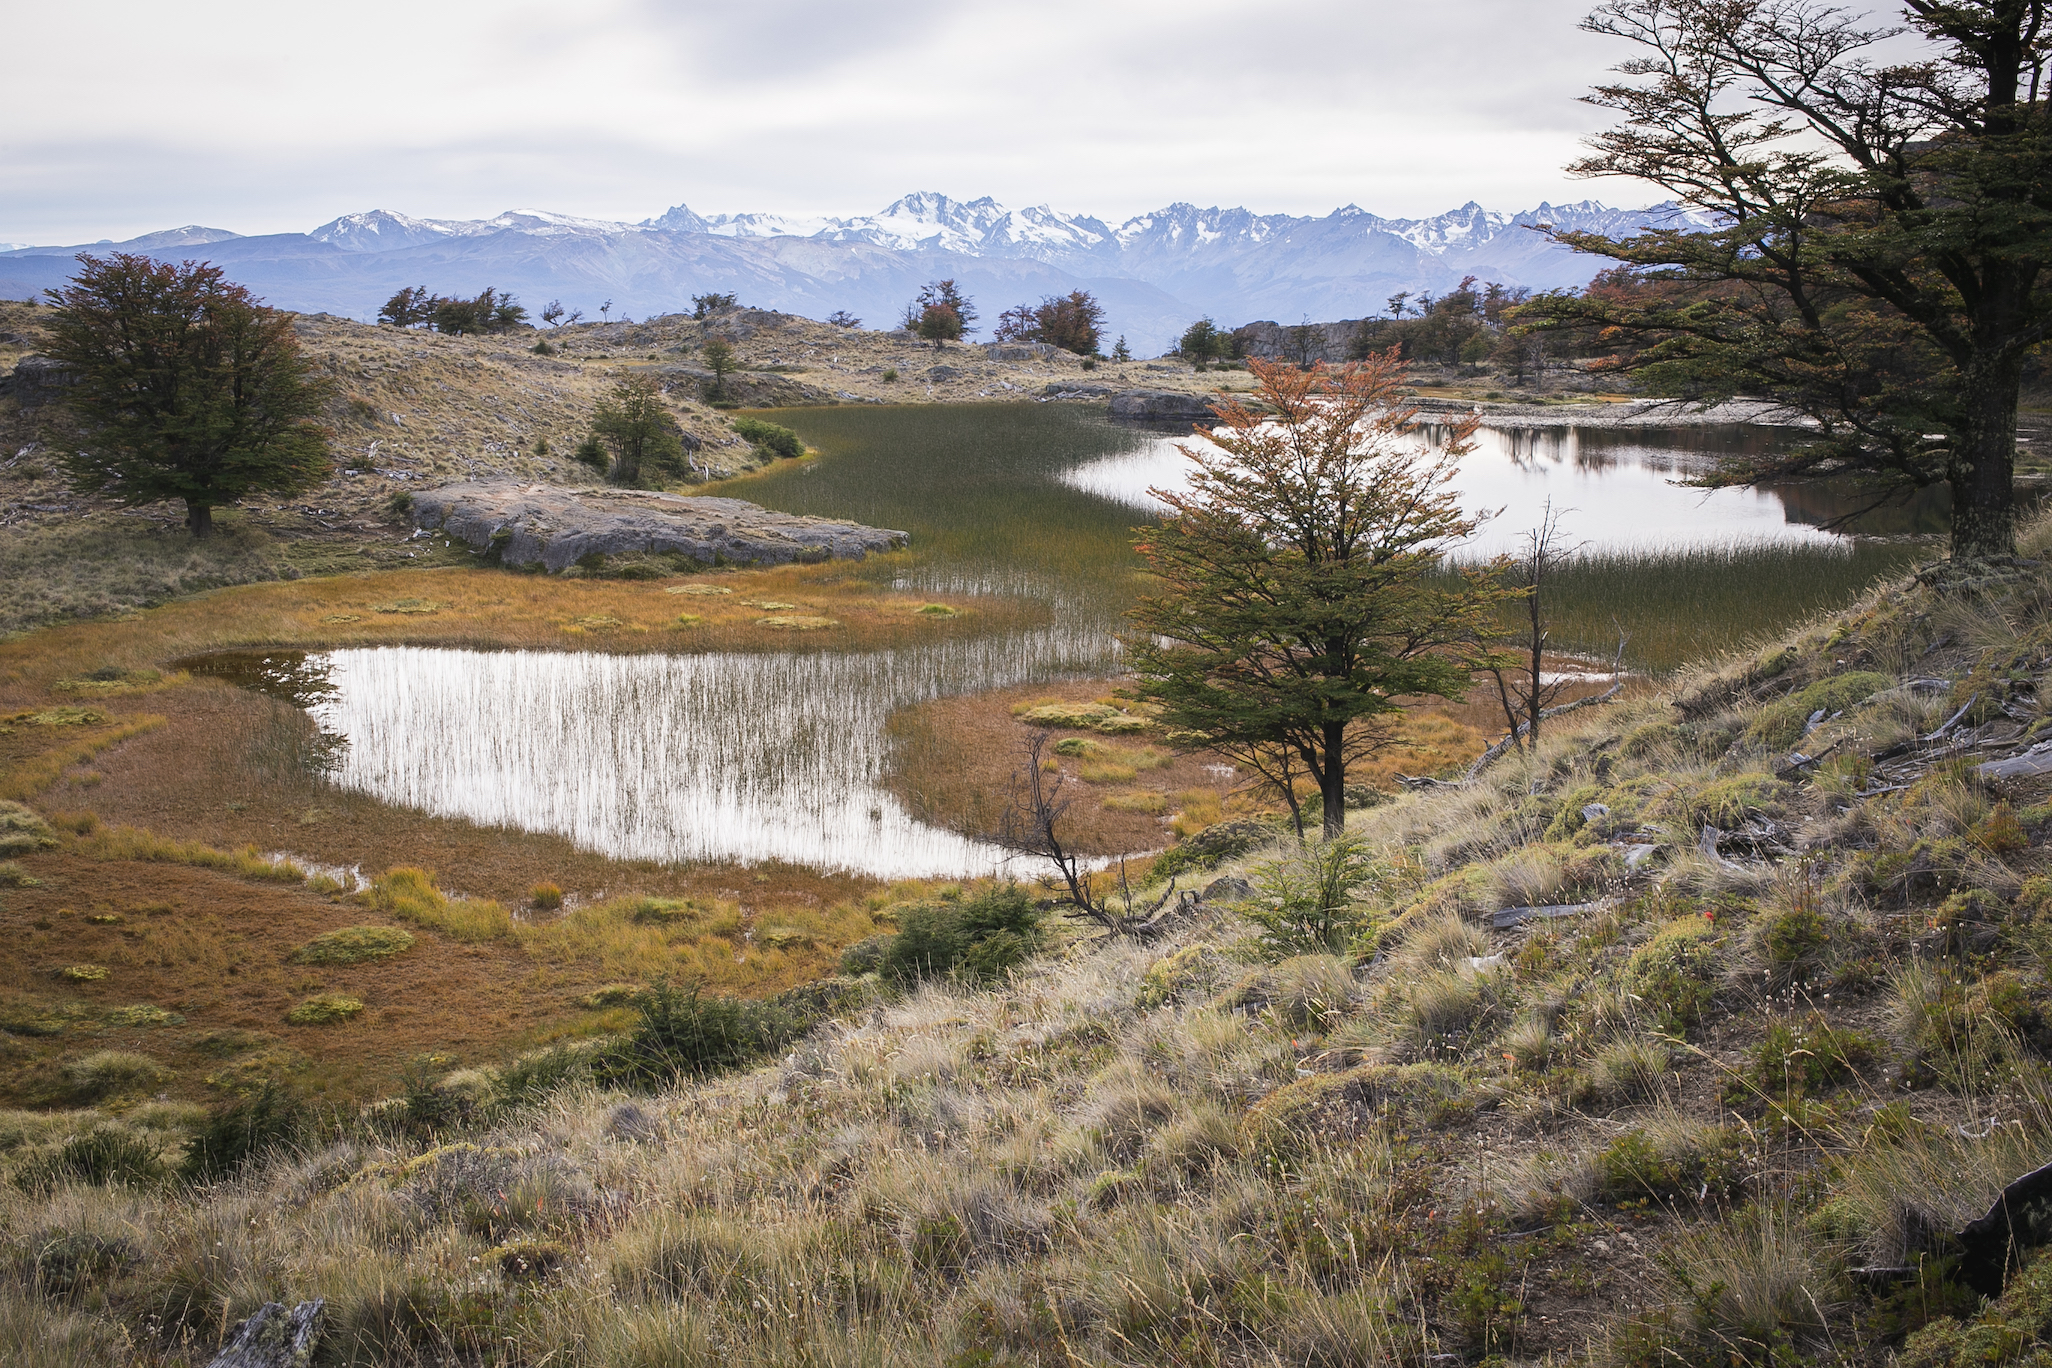 Patagonia2015-21.jpg